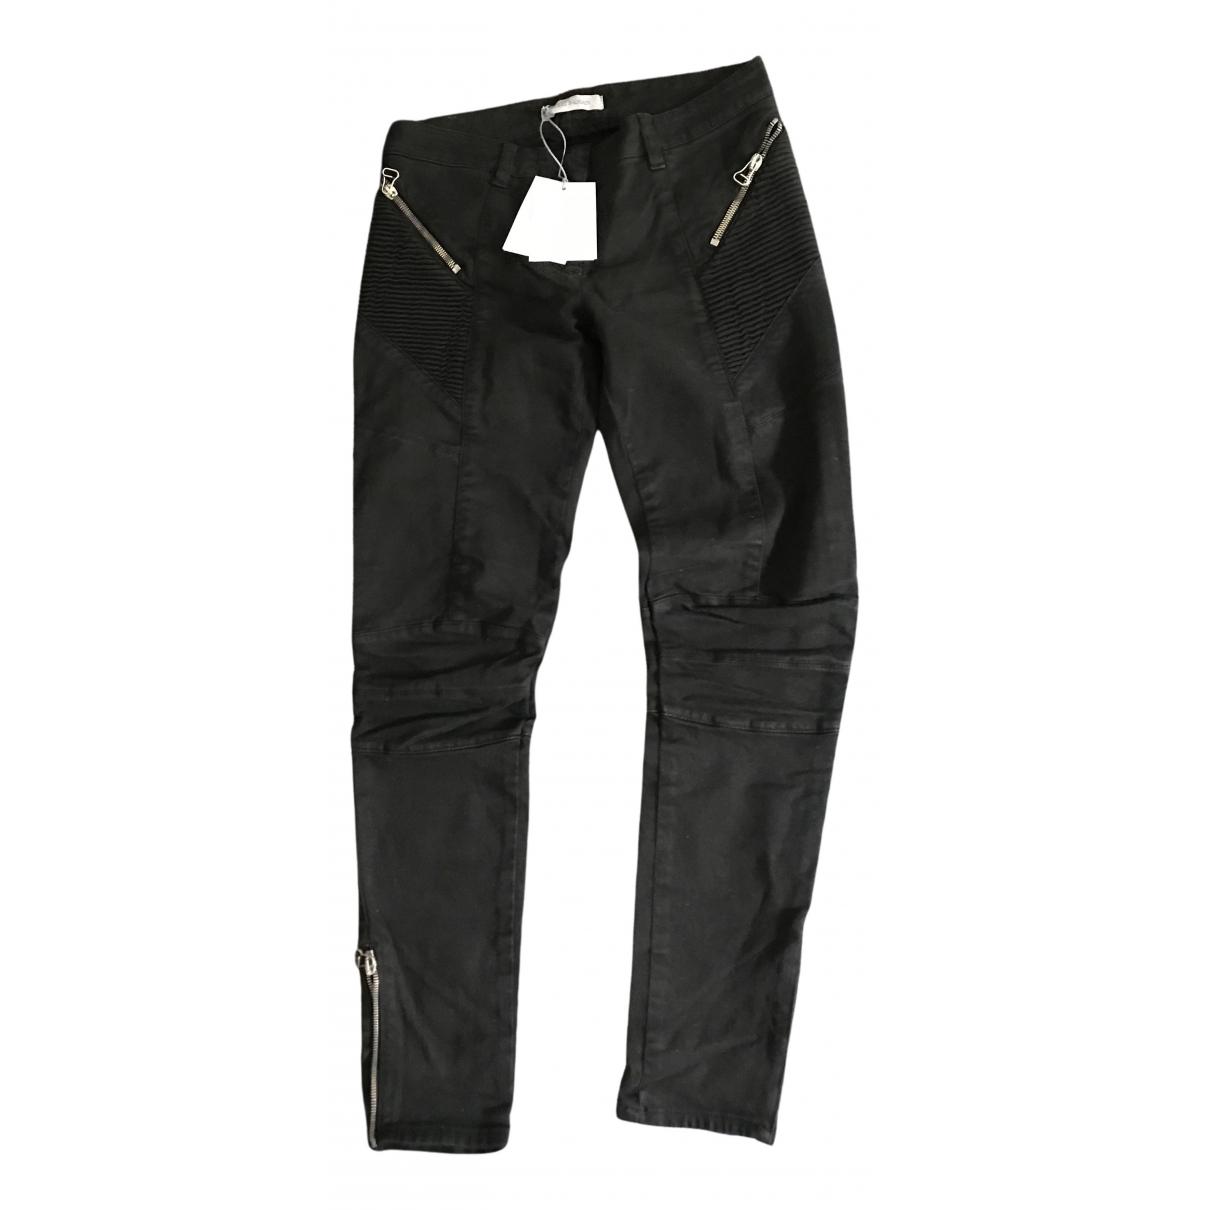 Pierre Balmain \N Black Cotton - elasthane Jeans for Women 26US